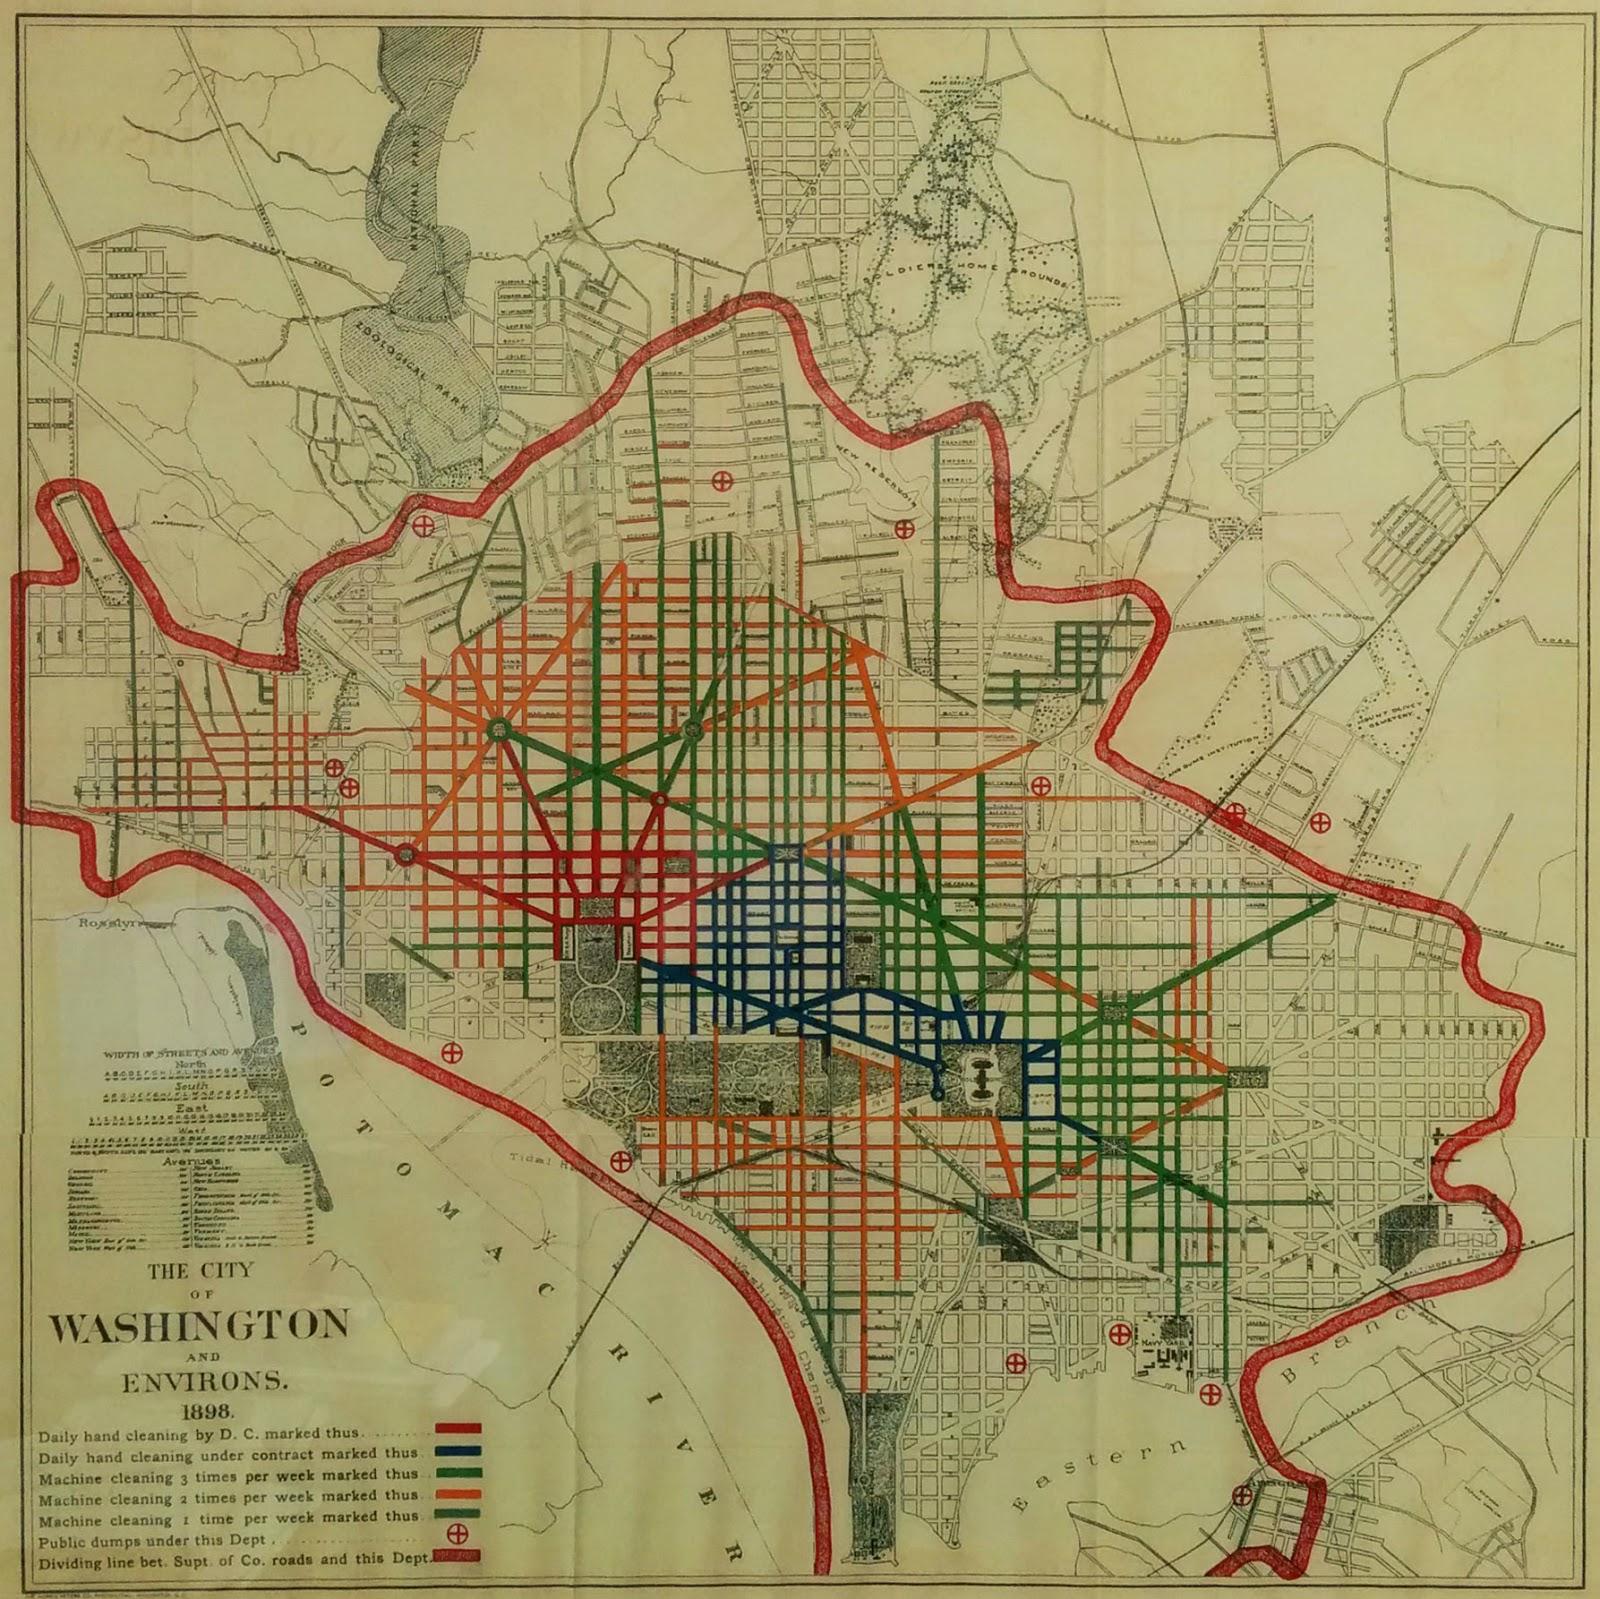 Dc Metro Map Overlay Street Map.Bloomingdale See A Street Map Of Bloomingdale And All Of Dc From 1898